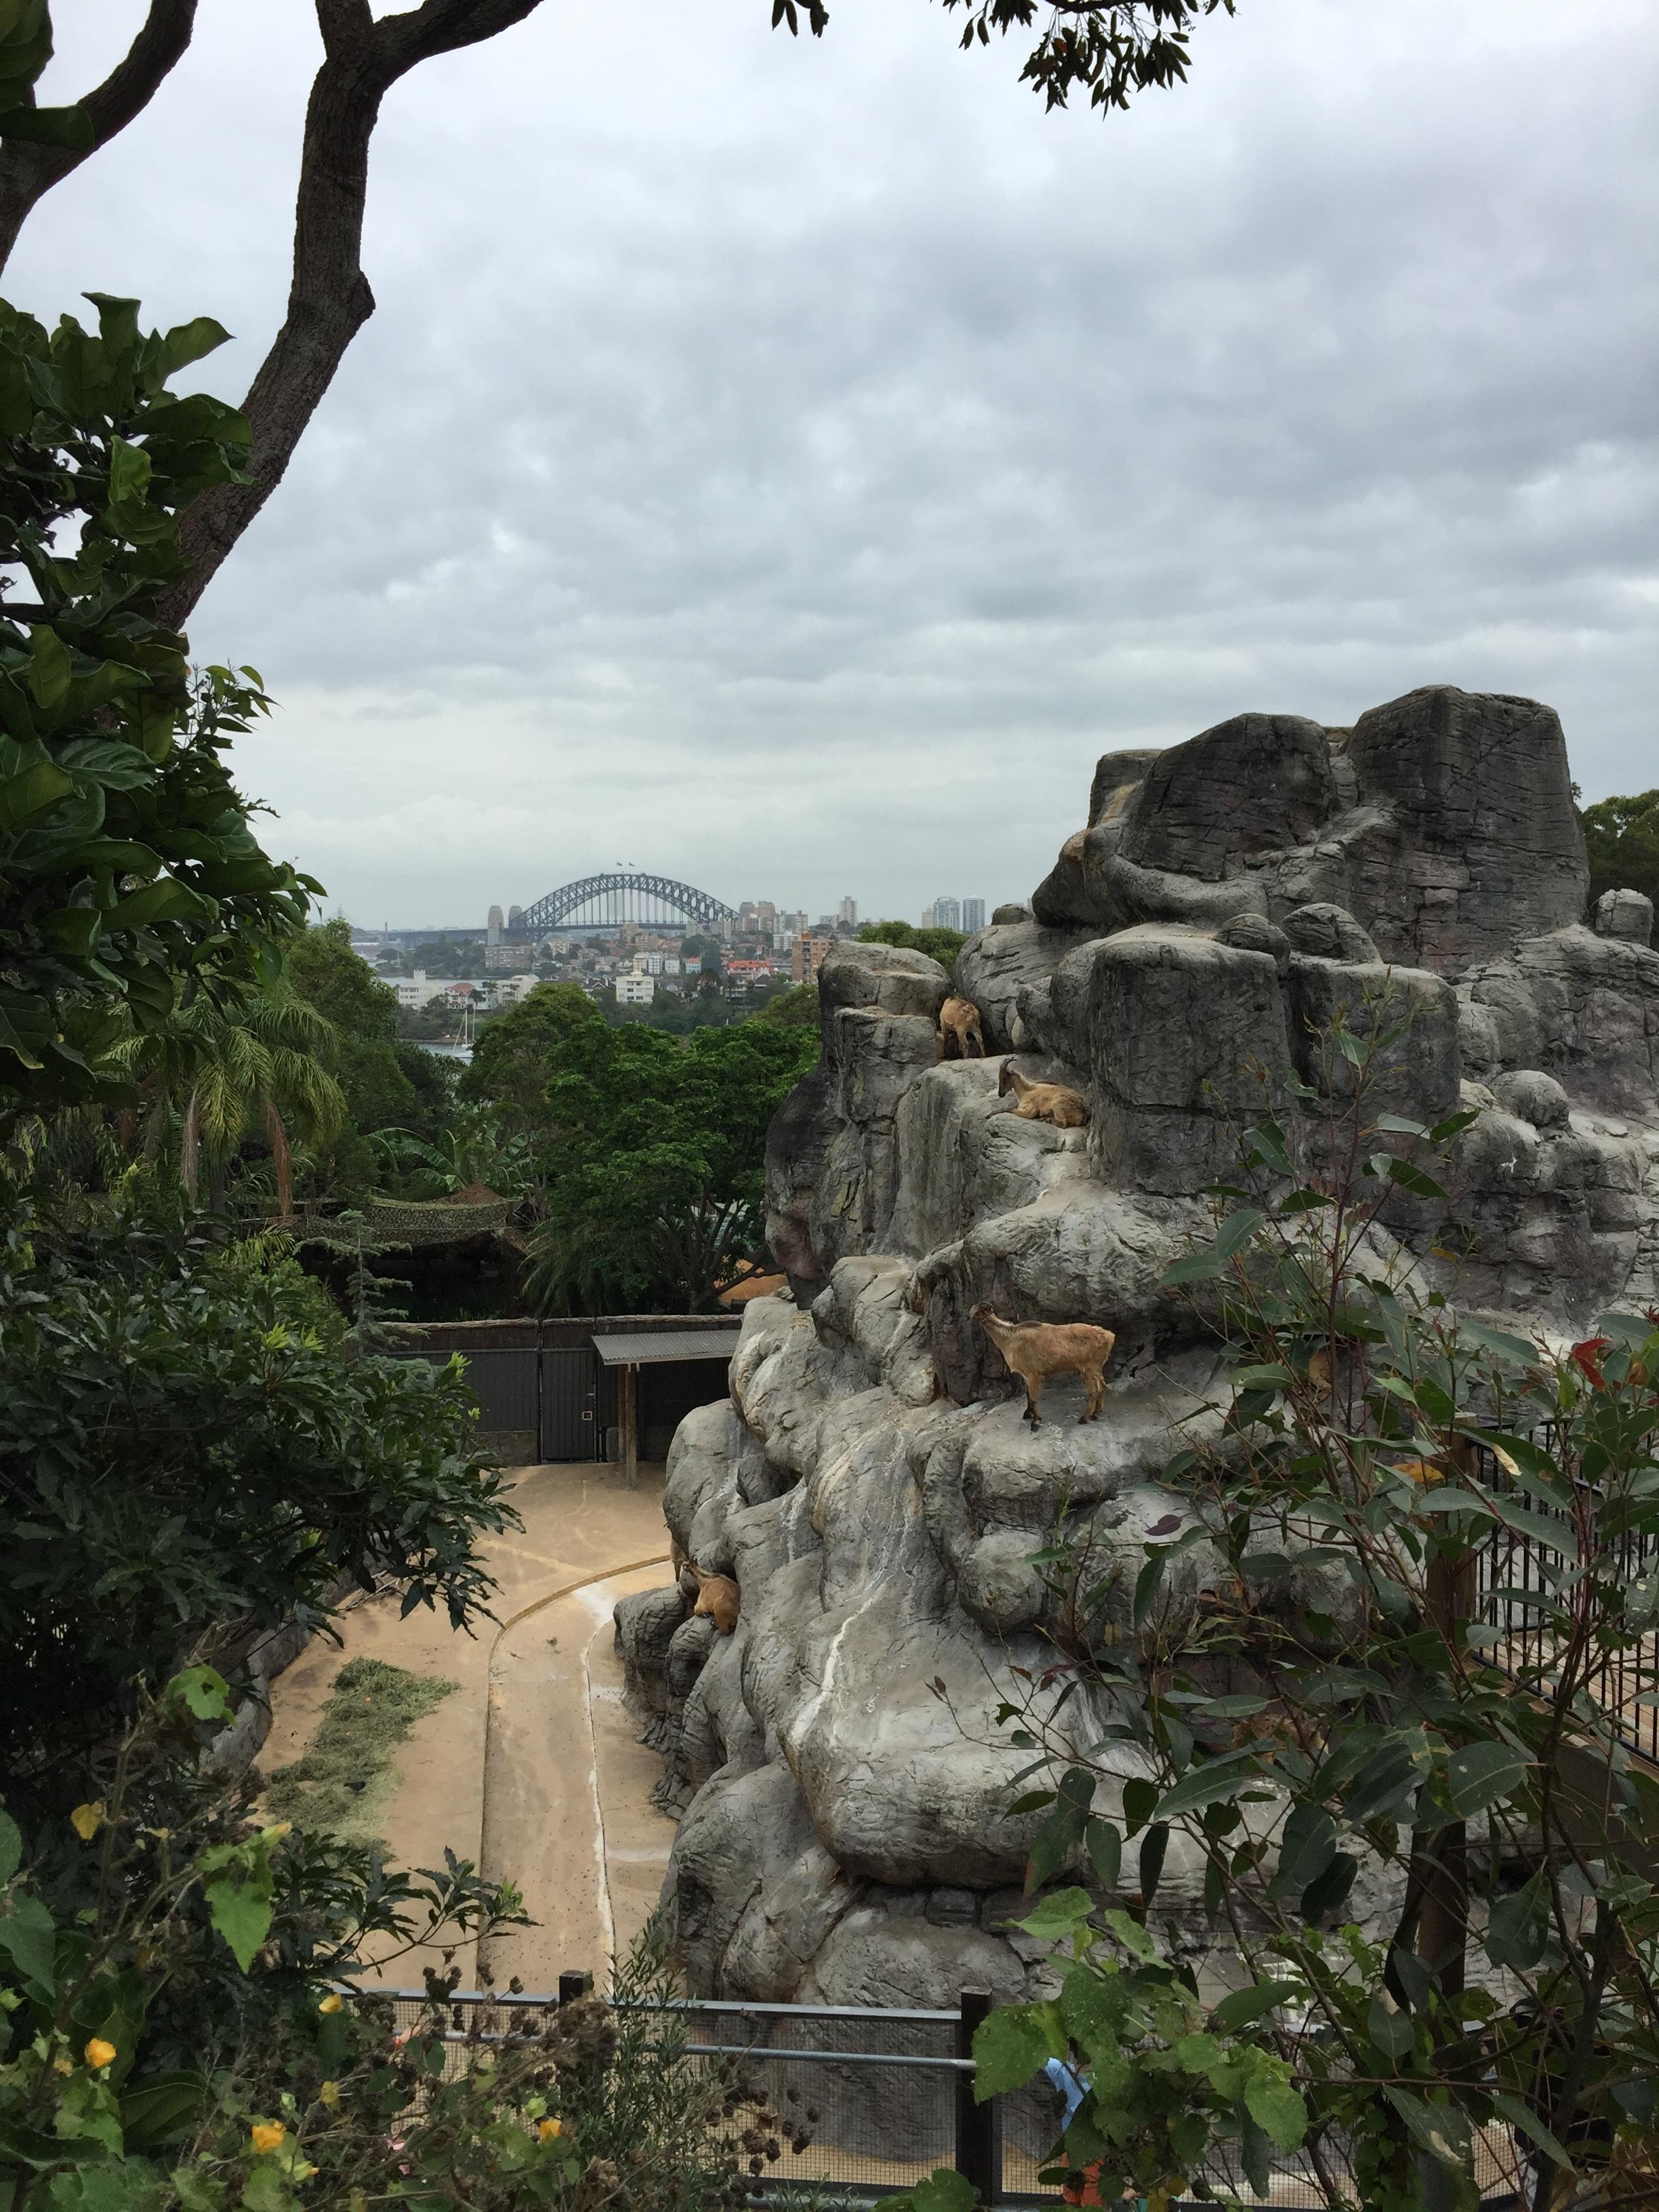 Taronga Zoo Sydney Australia - Goats and Views